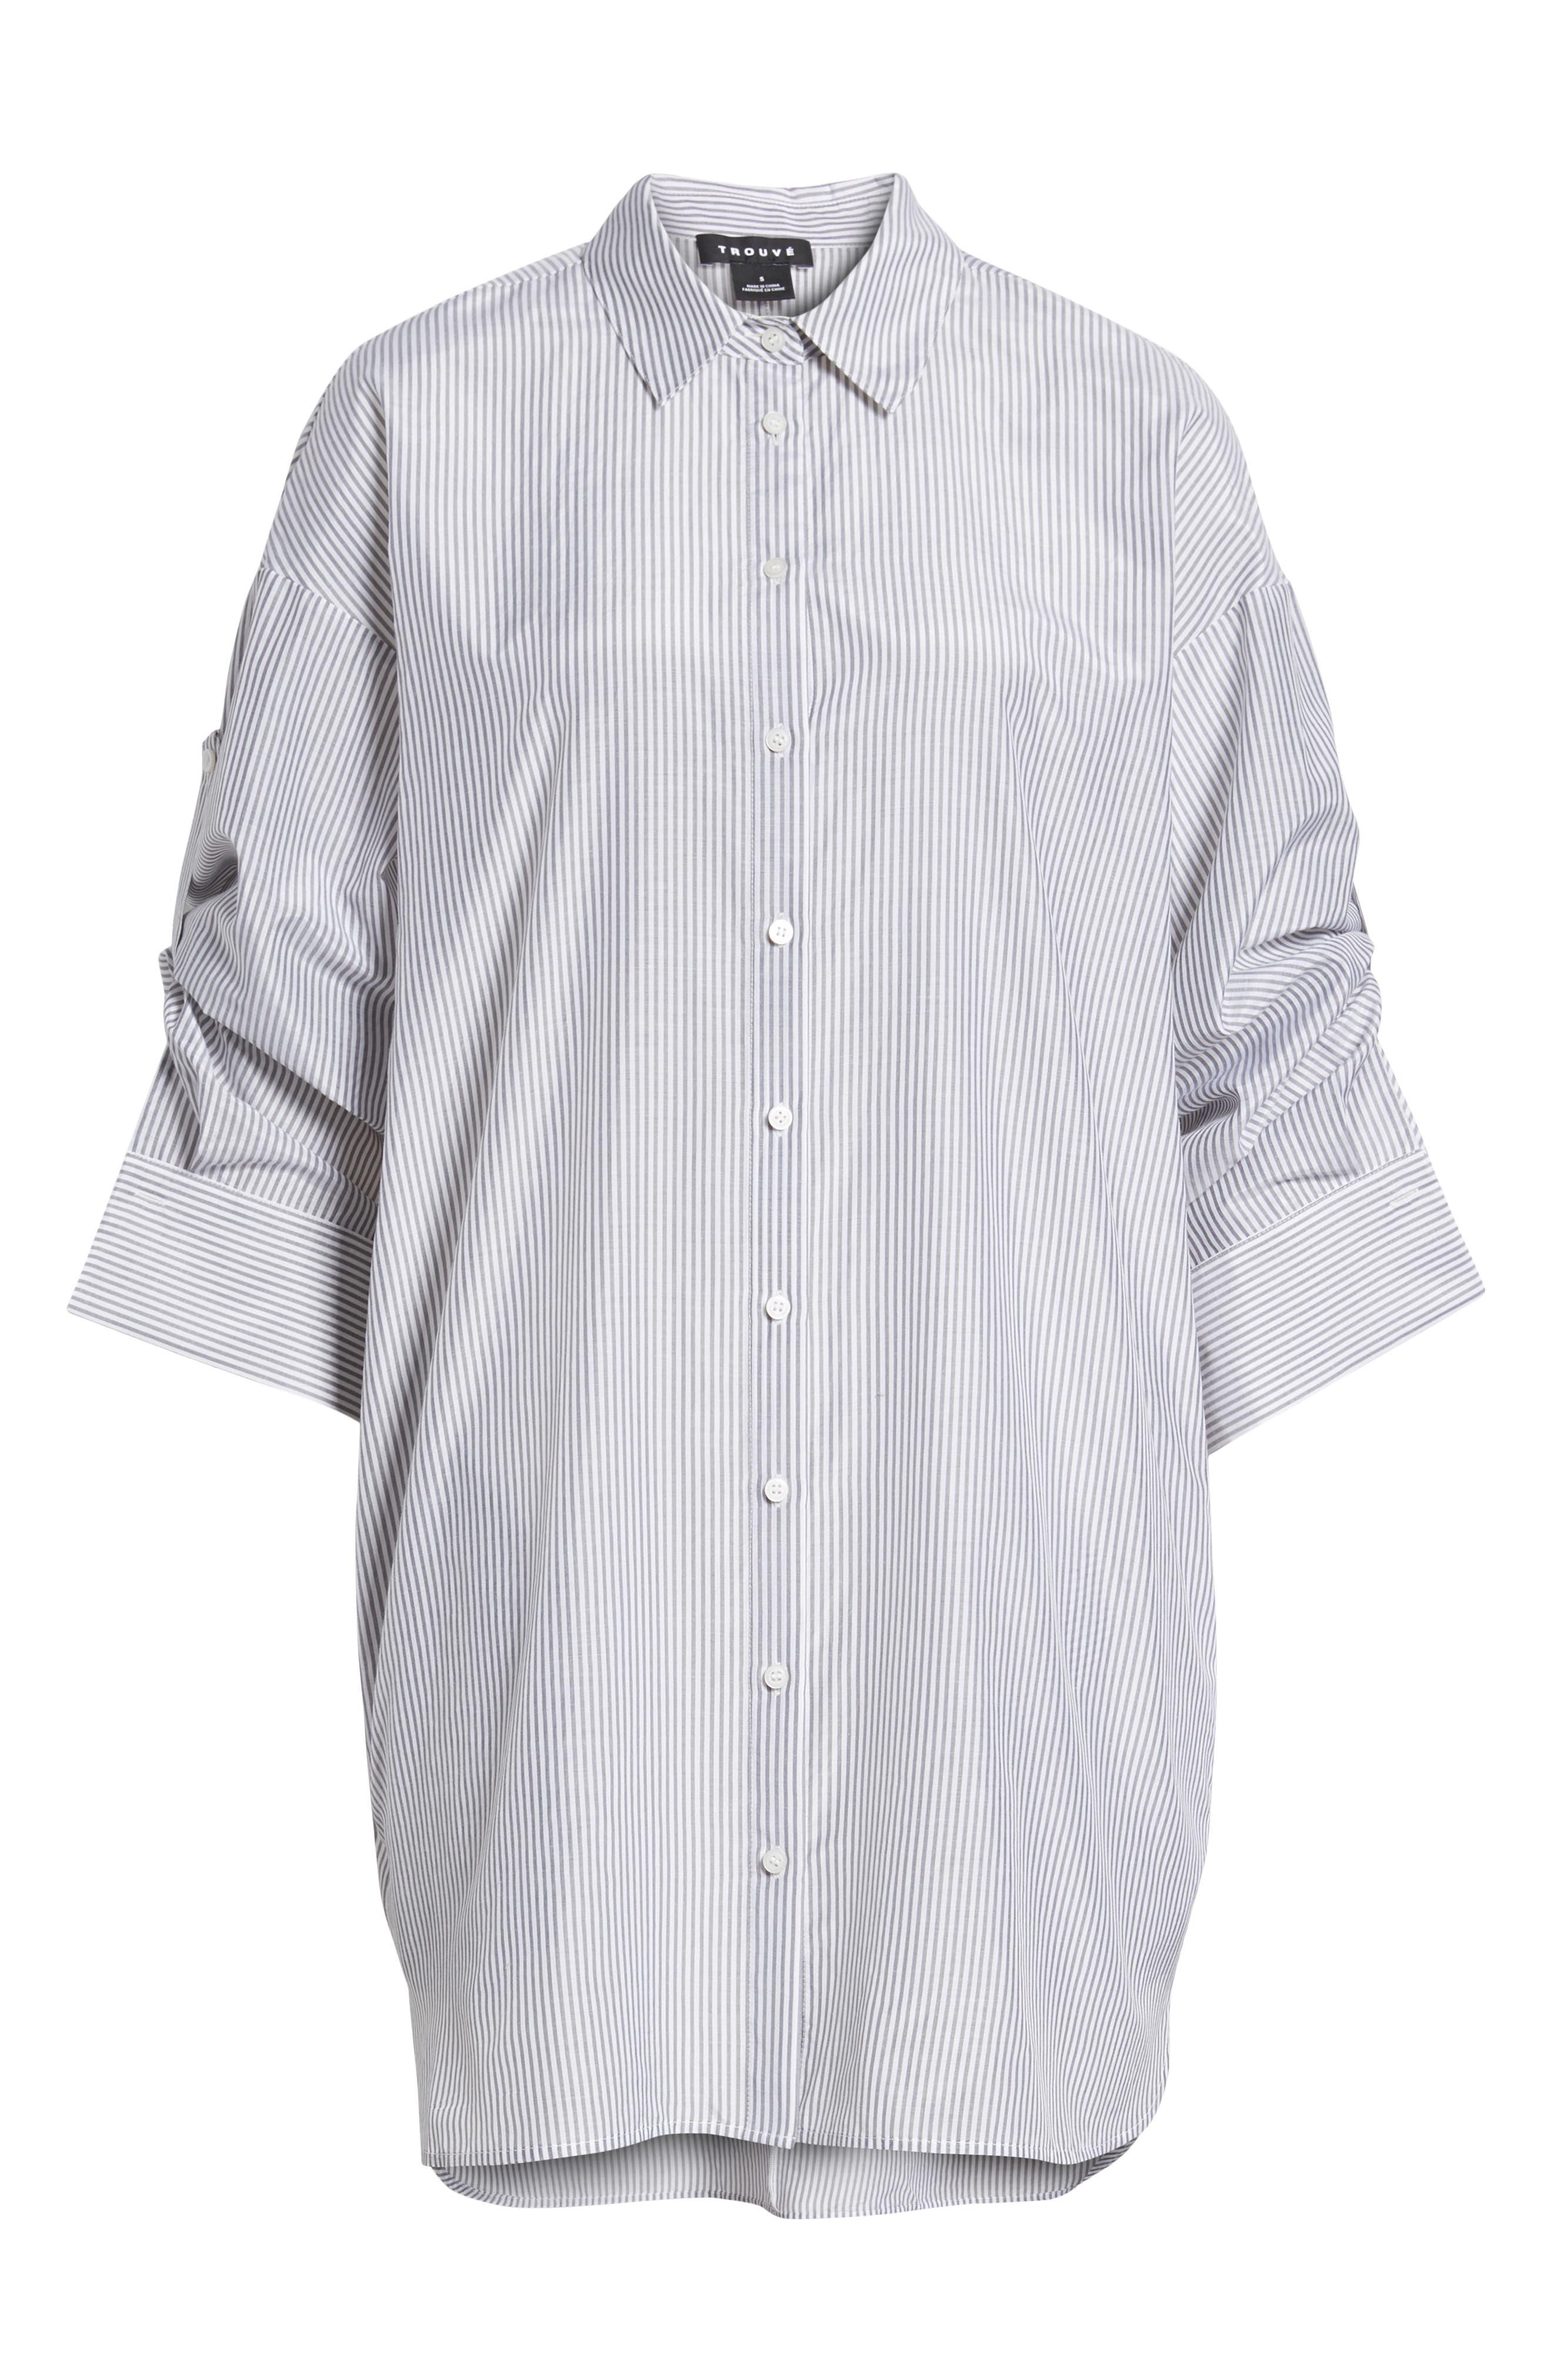 Stripe Cotton & Silk Shirtdress,                             Alternate thumbnail 7, color,                             White- Grey Even Stripe